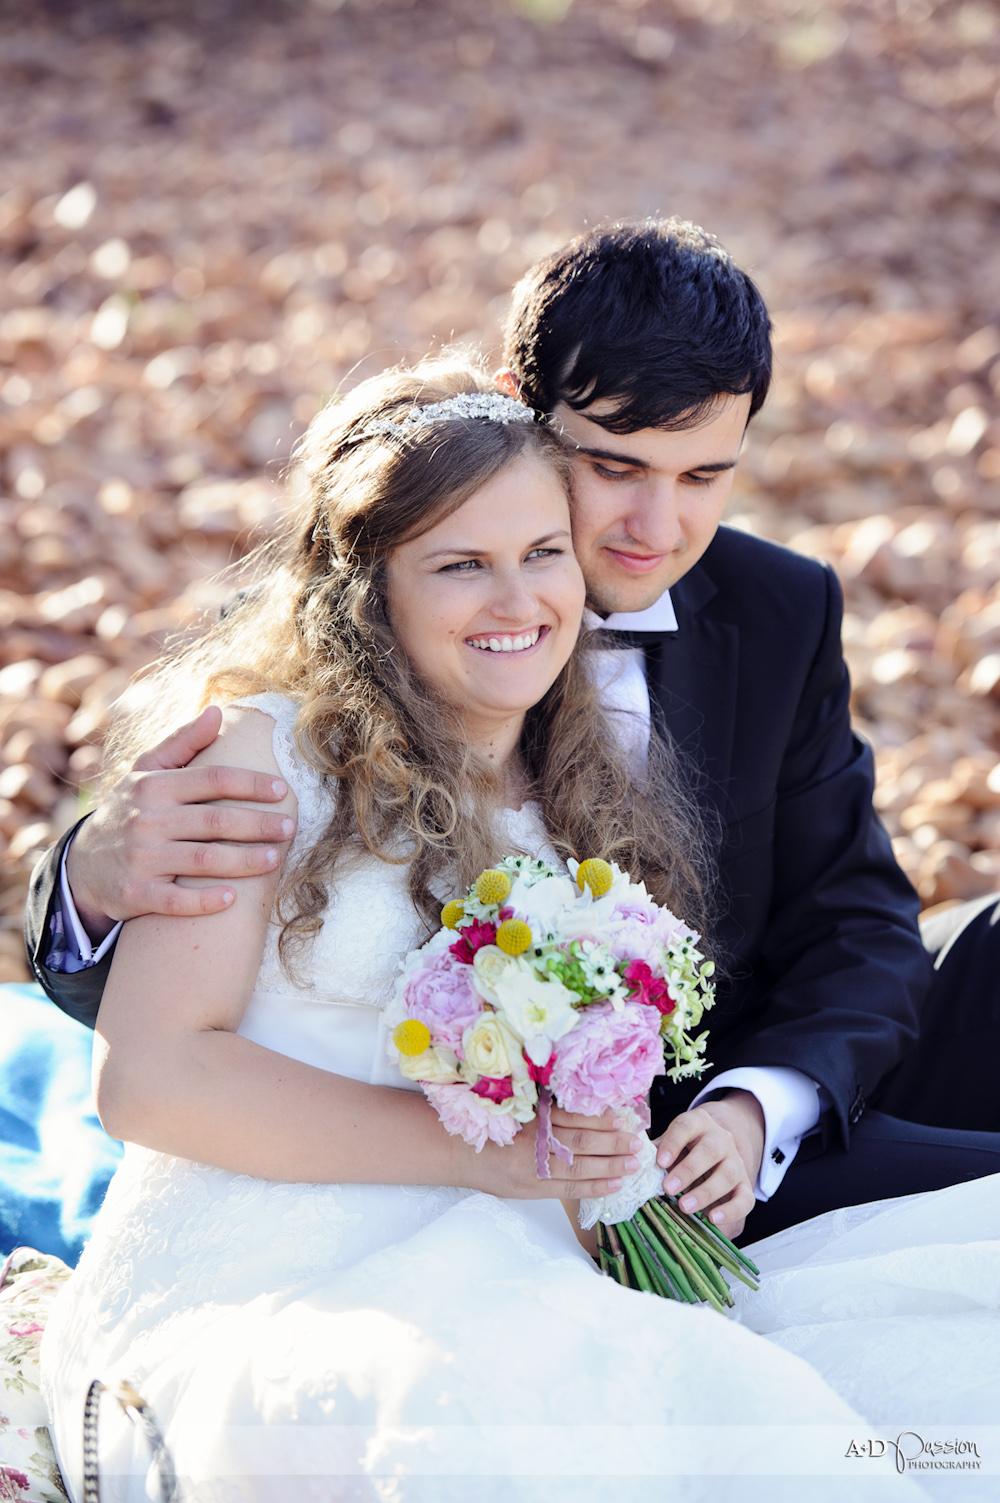 AD Passion Photography | ad-passion.com_fotograf-profesionist-nunta-spania_alice-si-eugen_0043 | Adelin, Dida, fotograf profesionist, fotograf de nunta, fotografie de nunta, fotograf Timisoara, fotograf Craiova, fotograf Bucuresti, fotograf Arad, nunta Timisoara, nunta Arad, nunta Bucuresti, nunta Craiova